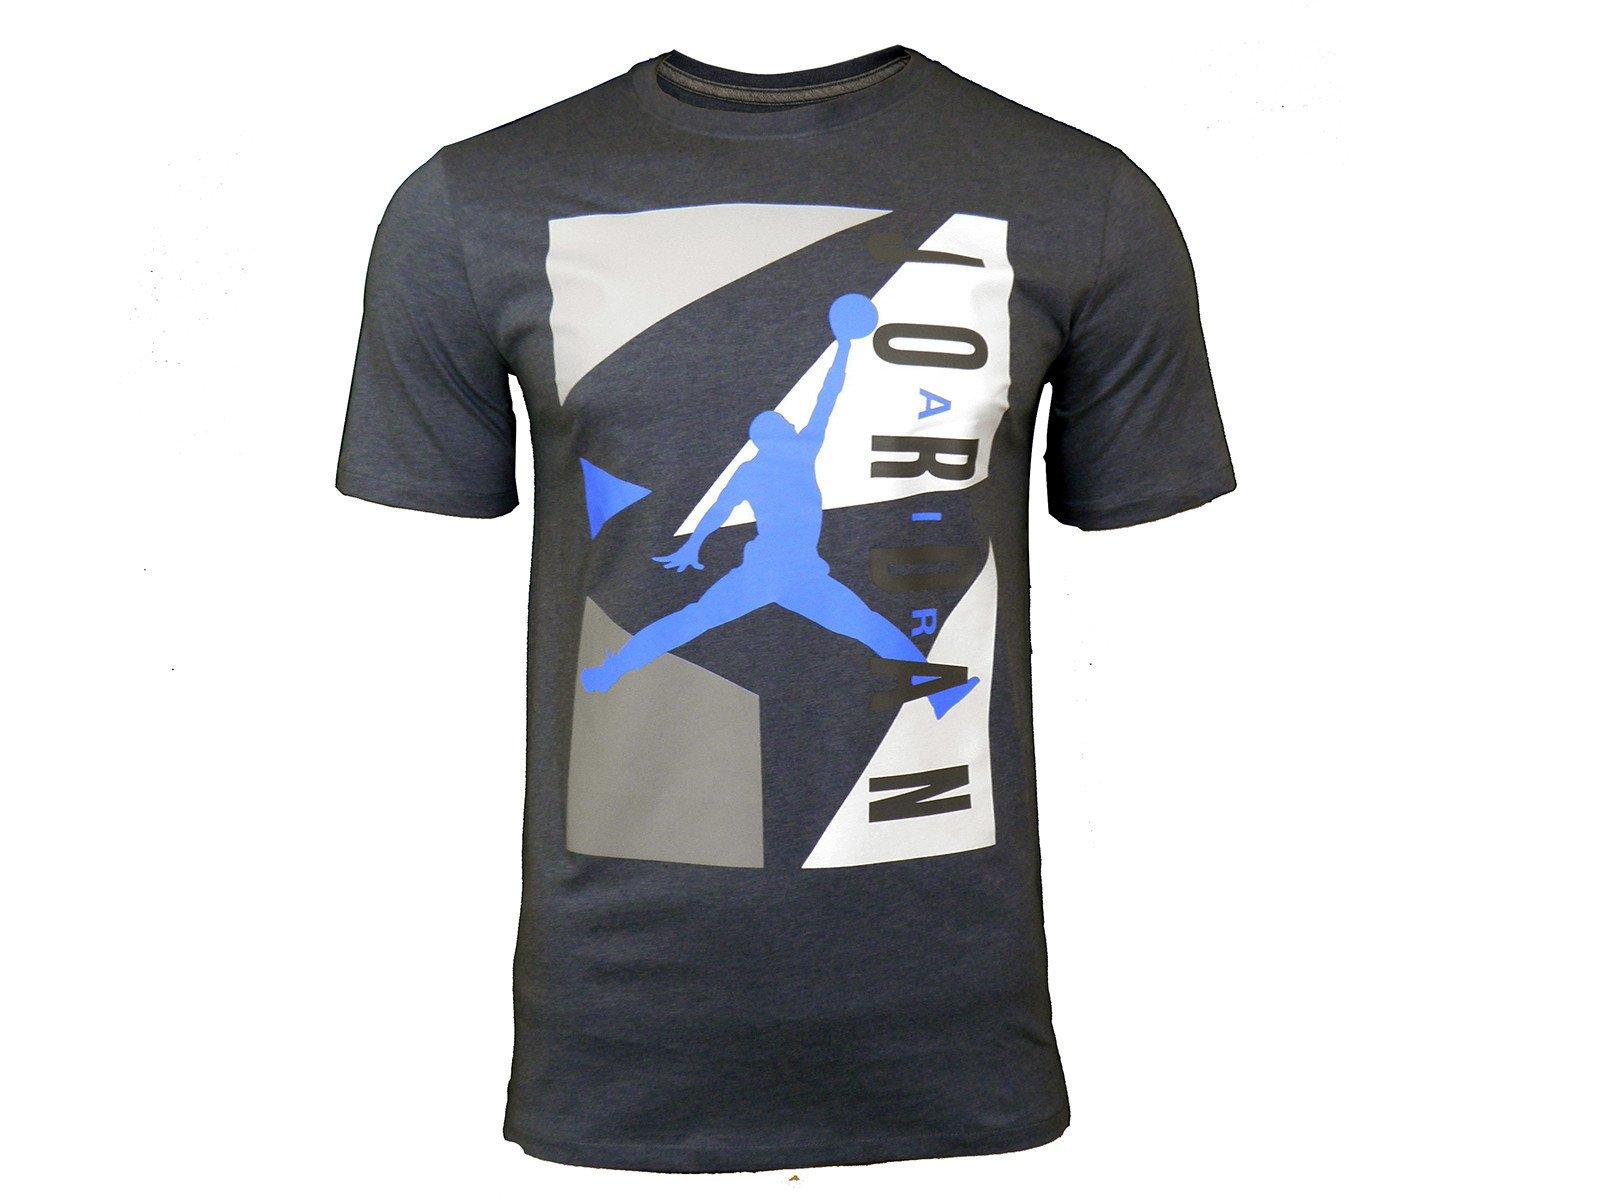 Nike Jordan Retro Tee T Shirt 659155 497 Basketball